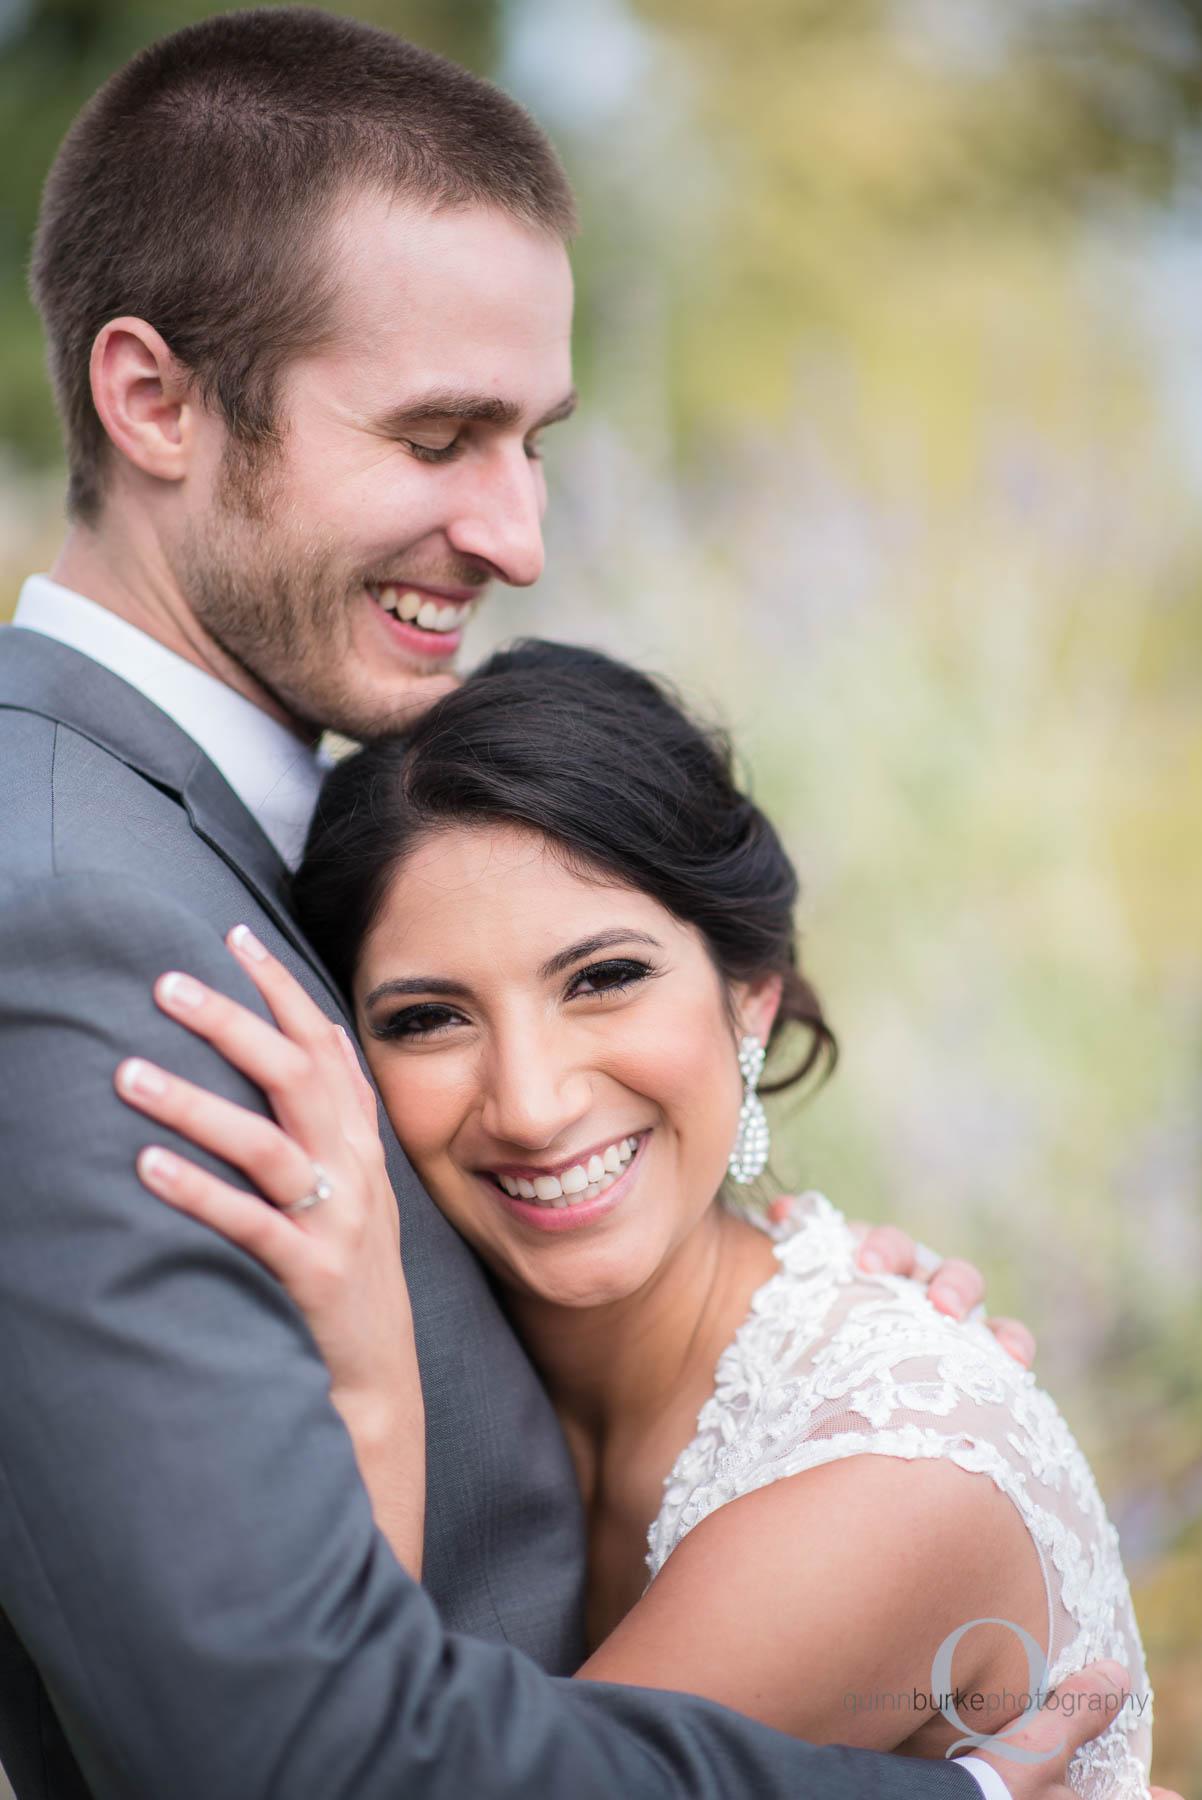 Green Villa Barn bride and groom laughing